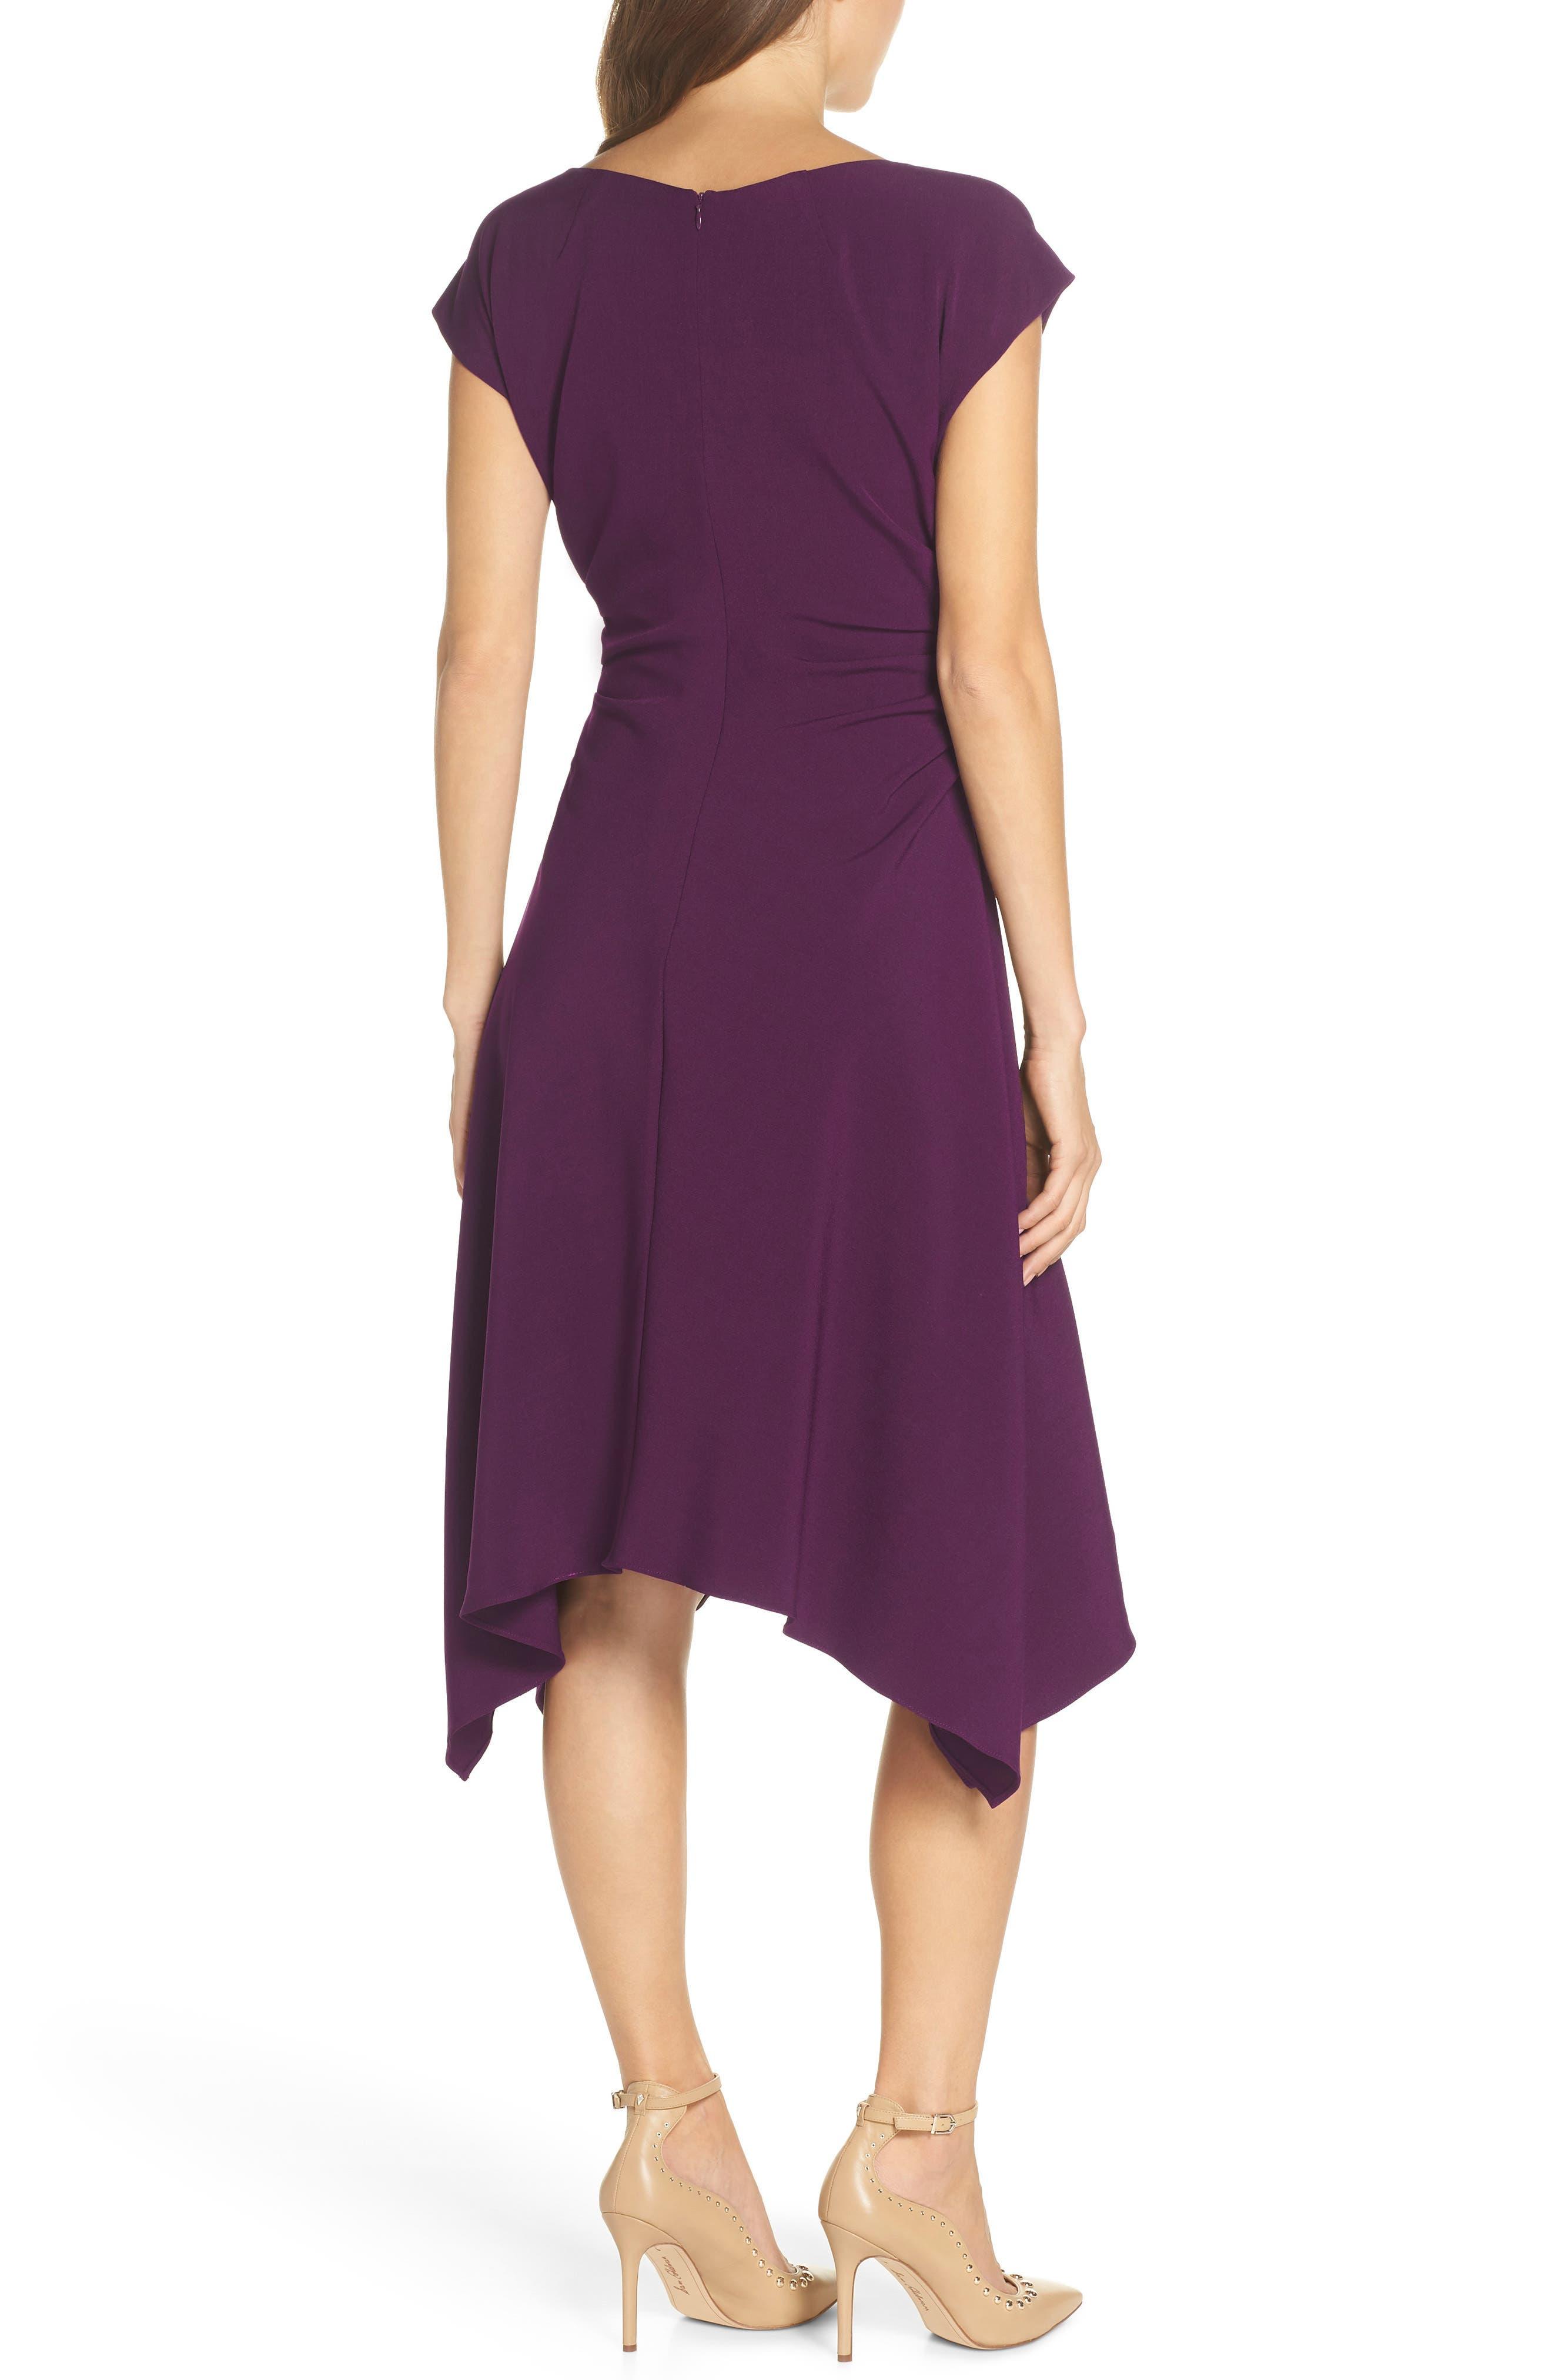 JULIA JORDAN,                             Ruched Stretch Crepe Fit & Flare Dress,                             Alternate thumbnail 2, color,                             PLUM